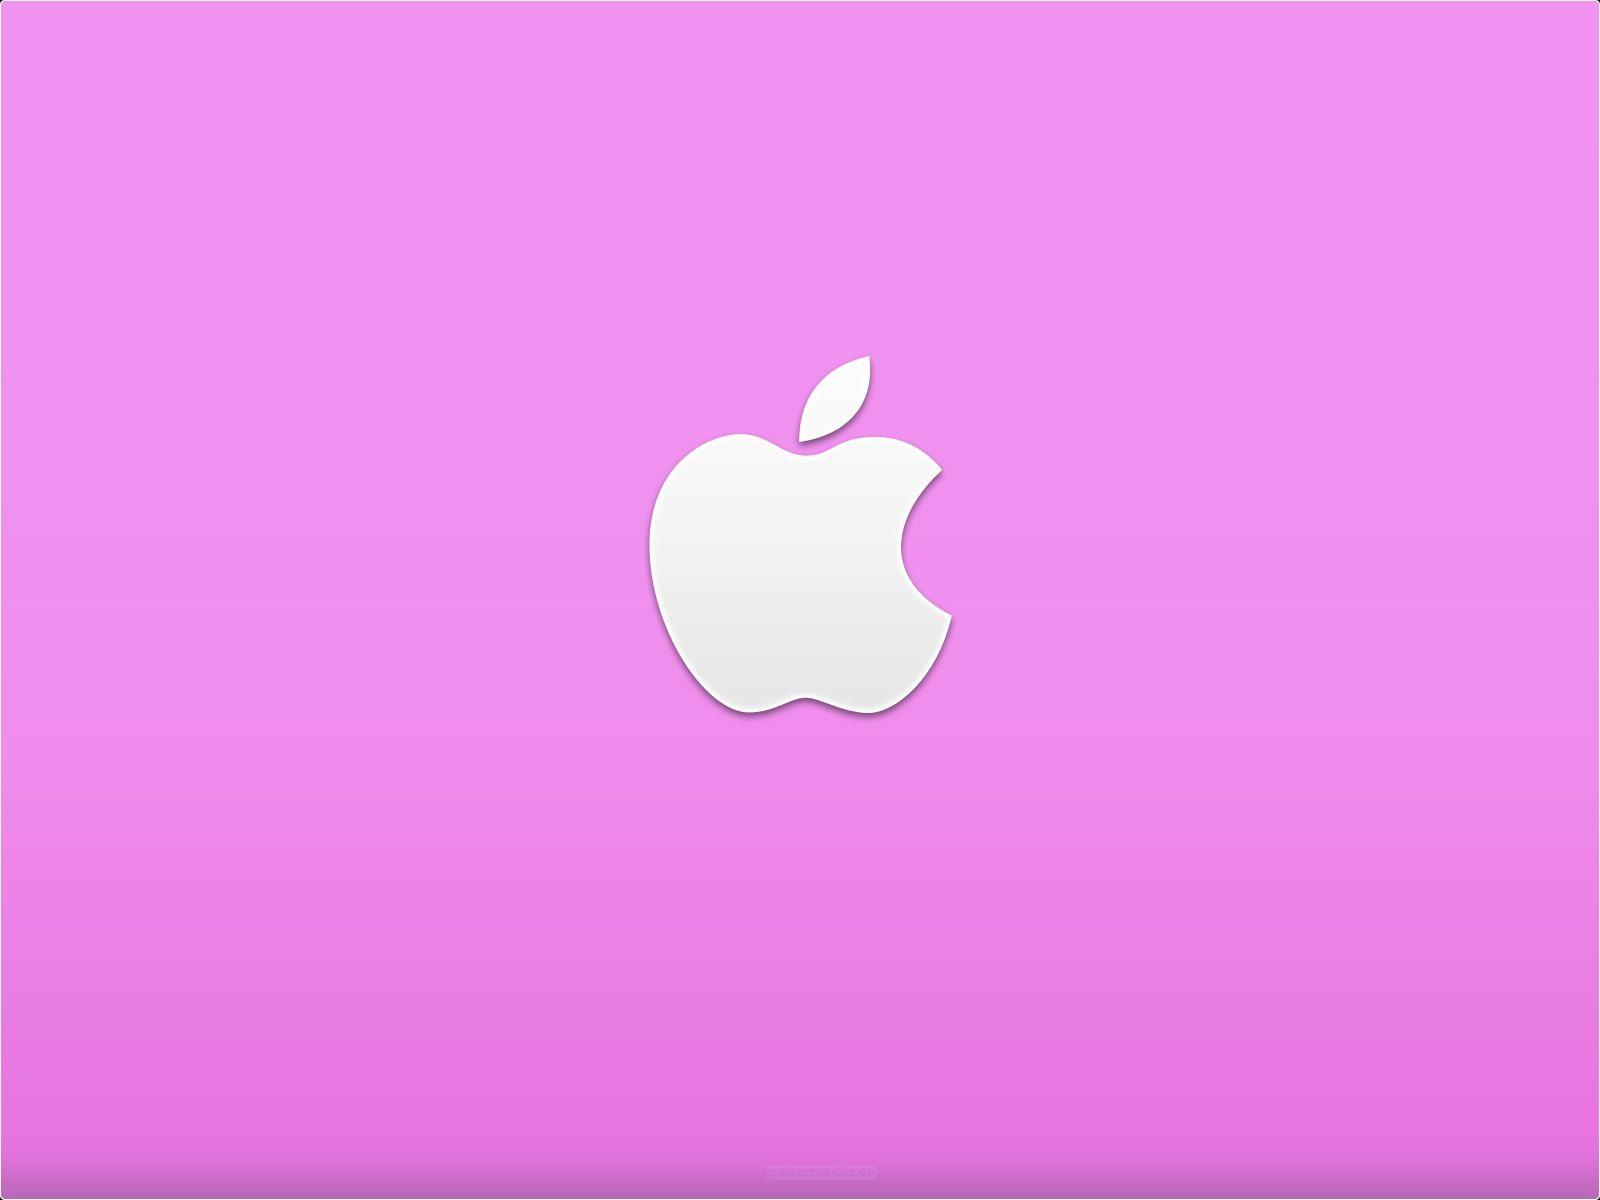 Wonderful Wallpaper Macbook Pink - ed8c802e3e8bc23093fd219bdbc12836  Photograph_5199.jpg